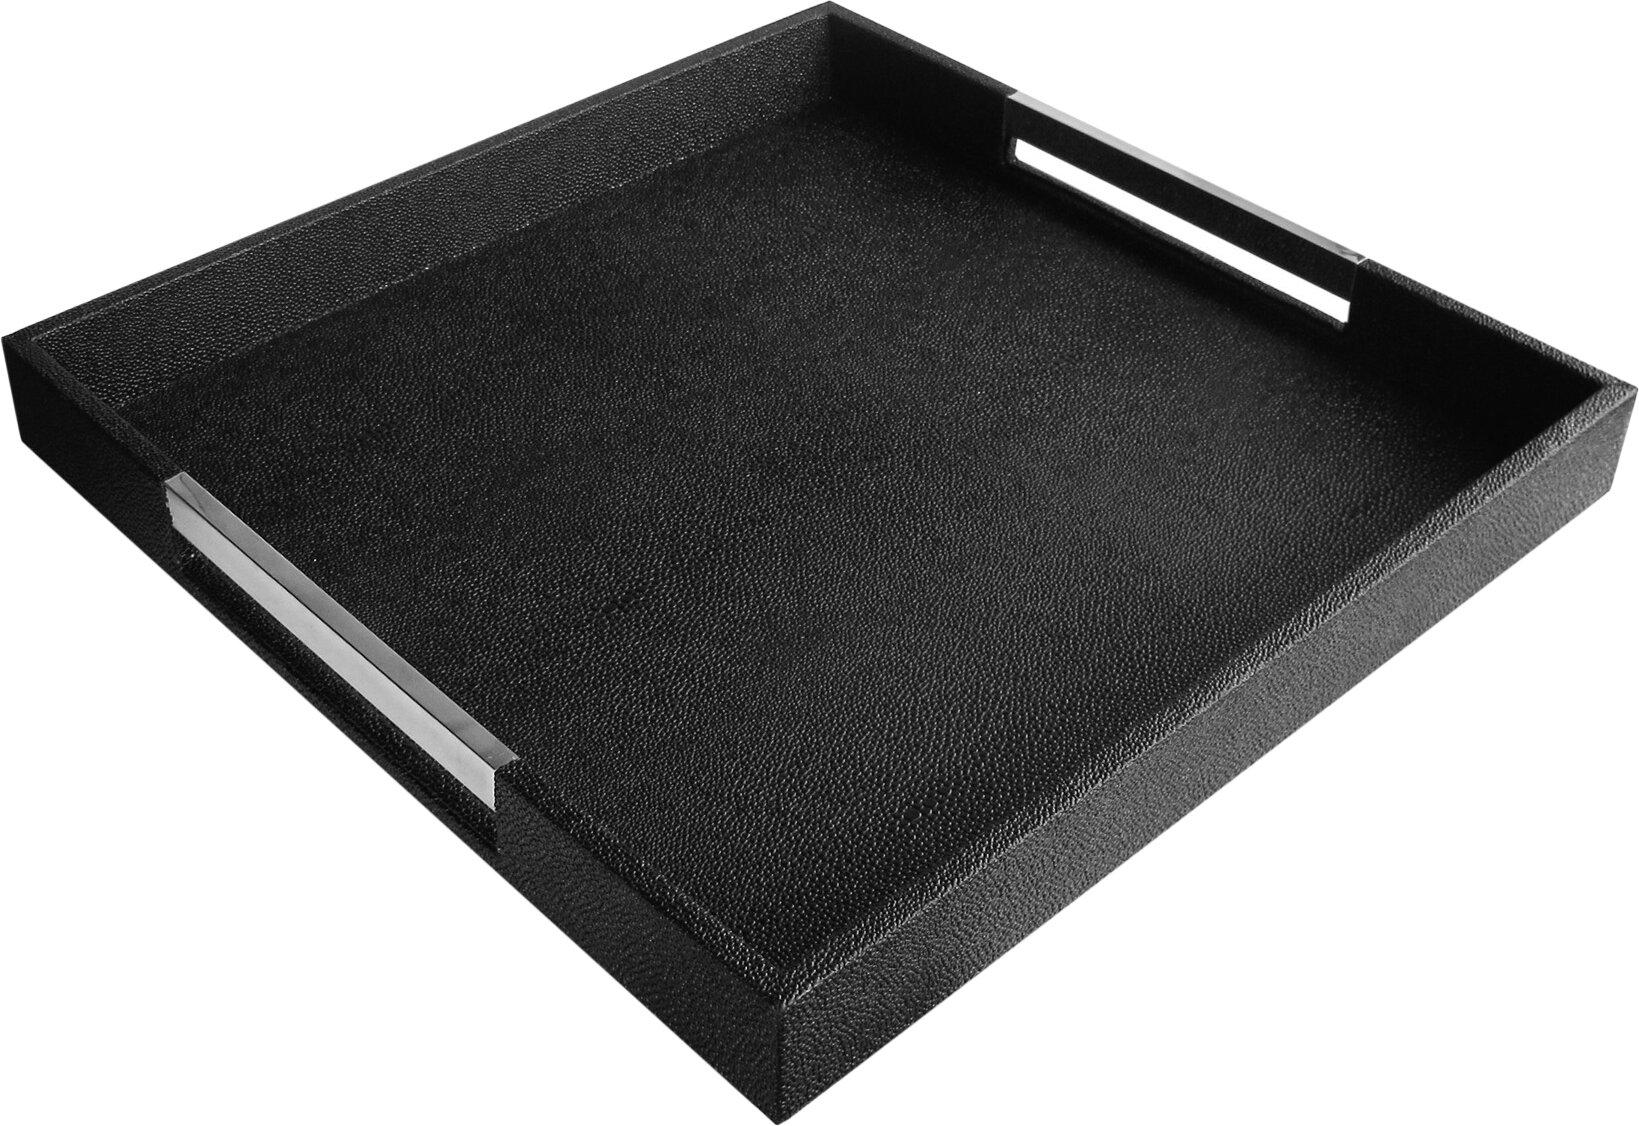 Blesiya Decorative Tray Metal Vanity Tray Square Rectangle Serving Platter